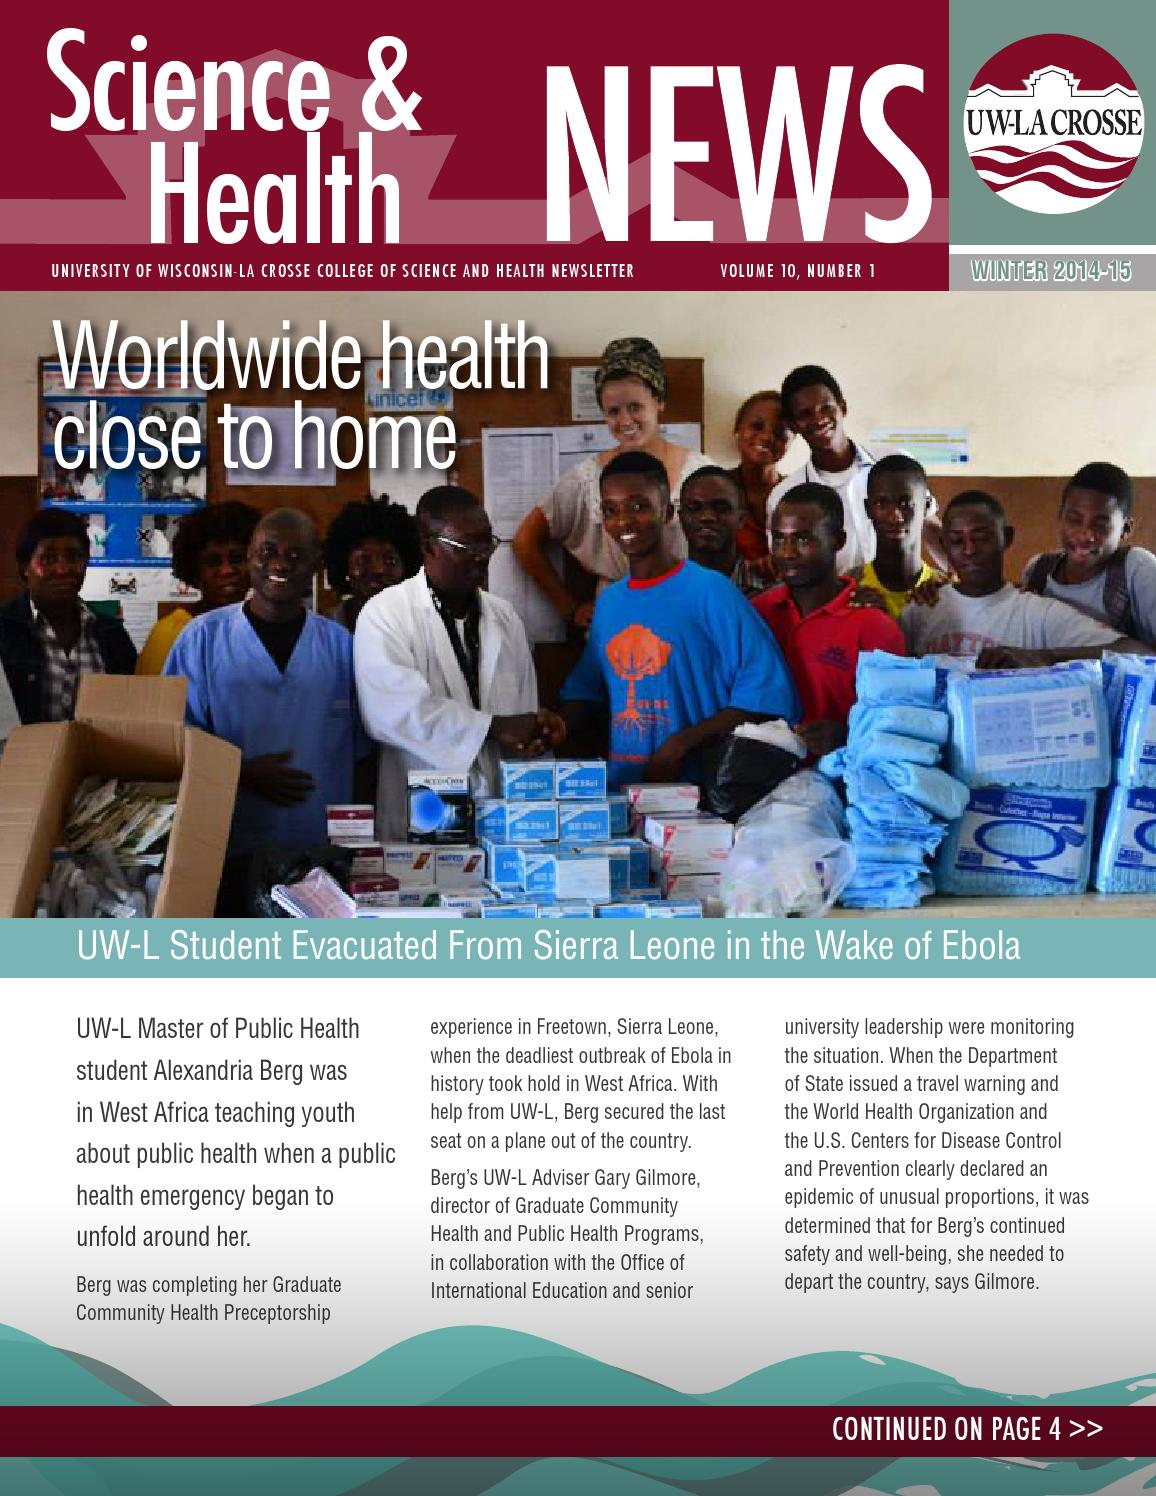 Berg katherine physical therapy - Uw La Crosse Csh Science Health Winter 2014 15 By University Of Wisconsin La Crosse Issuu